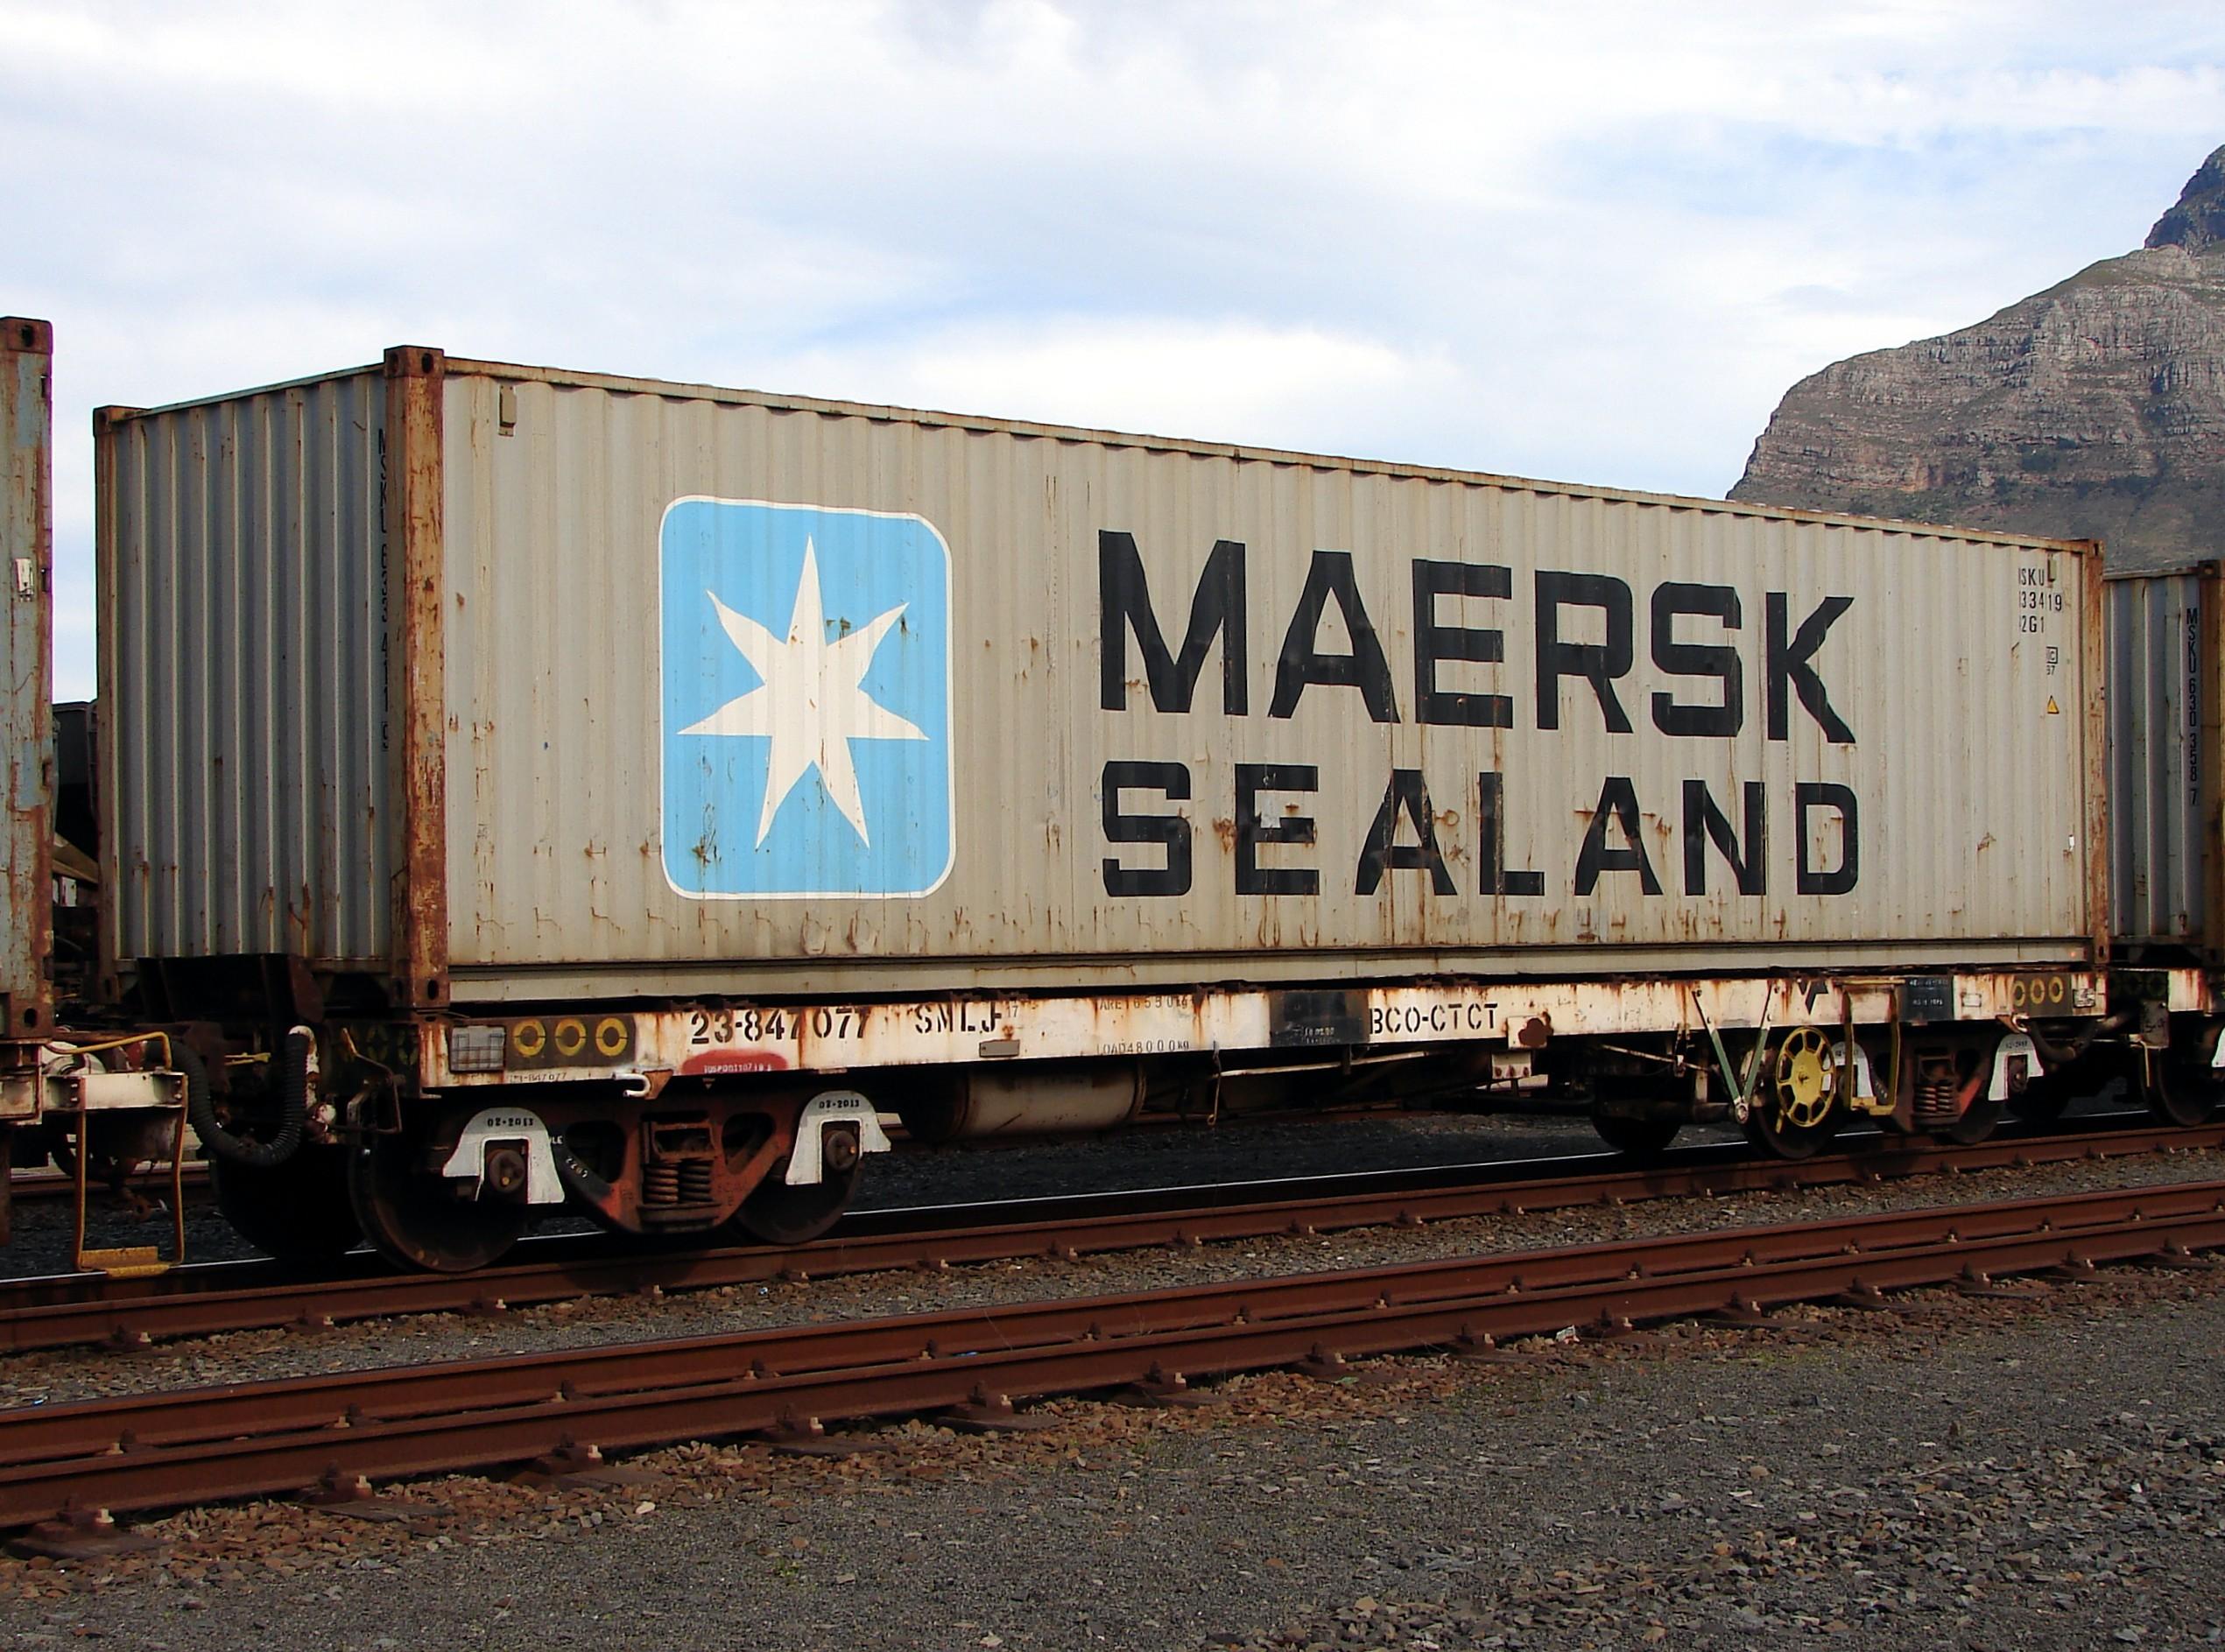 File:Maersk SeaLand 42G1 MSKU 633411 9 jpg - Wikimedia Commons